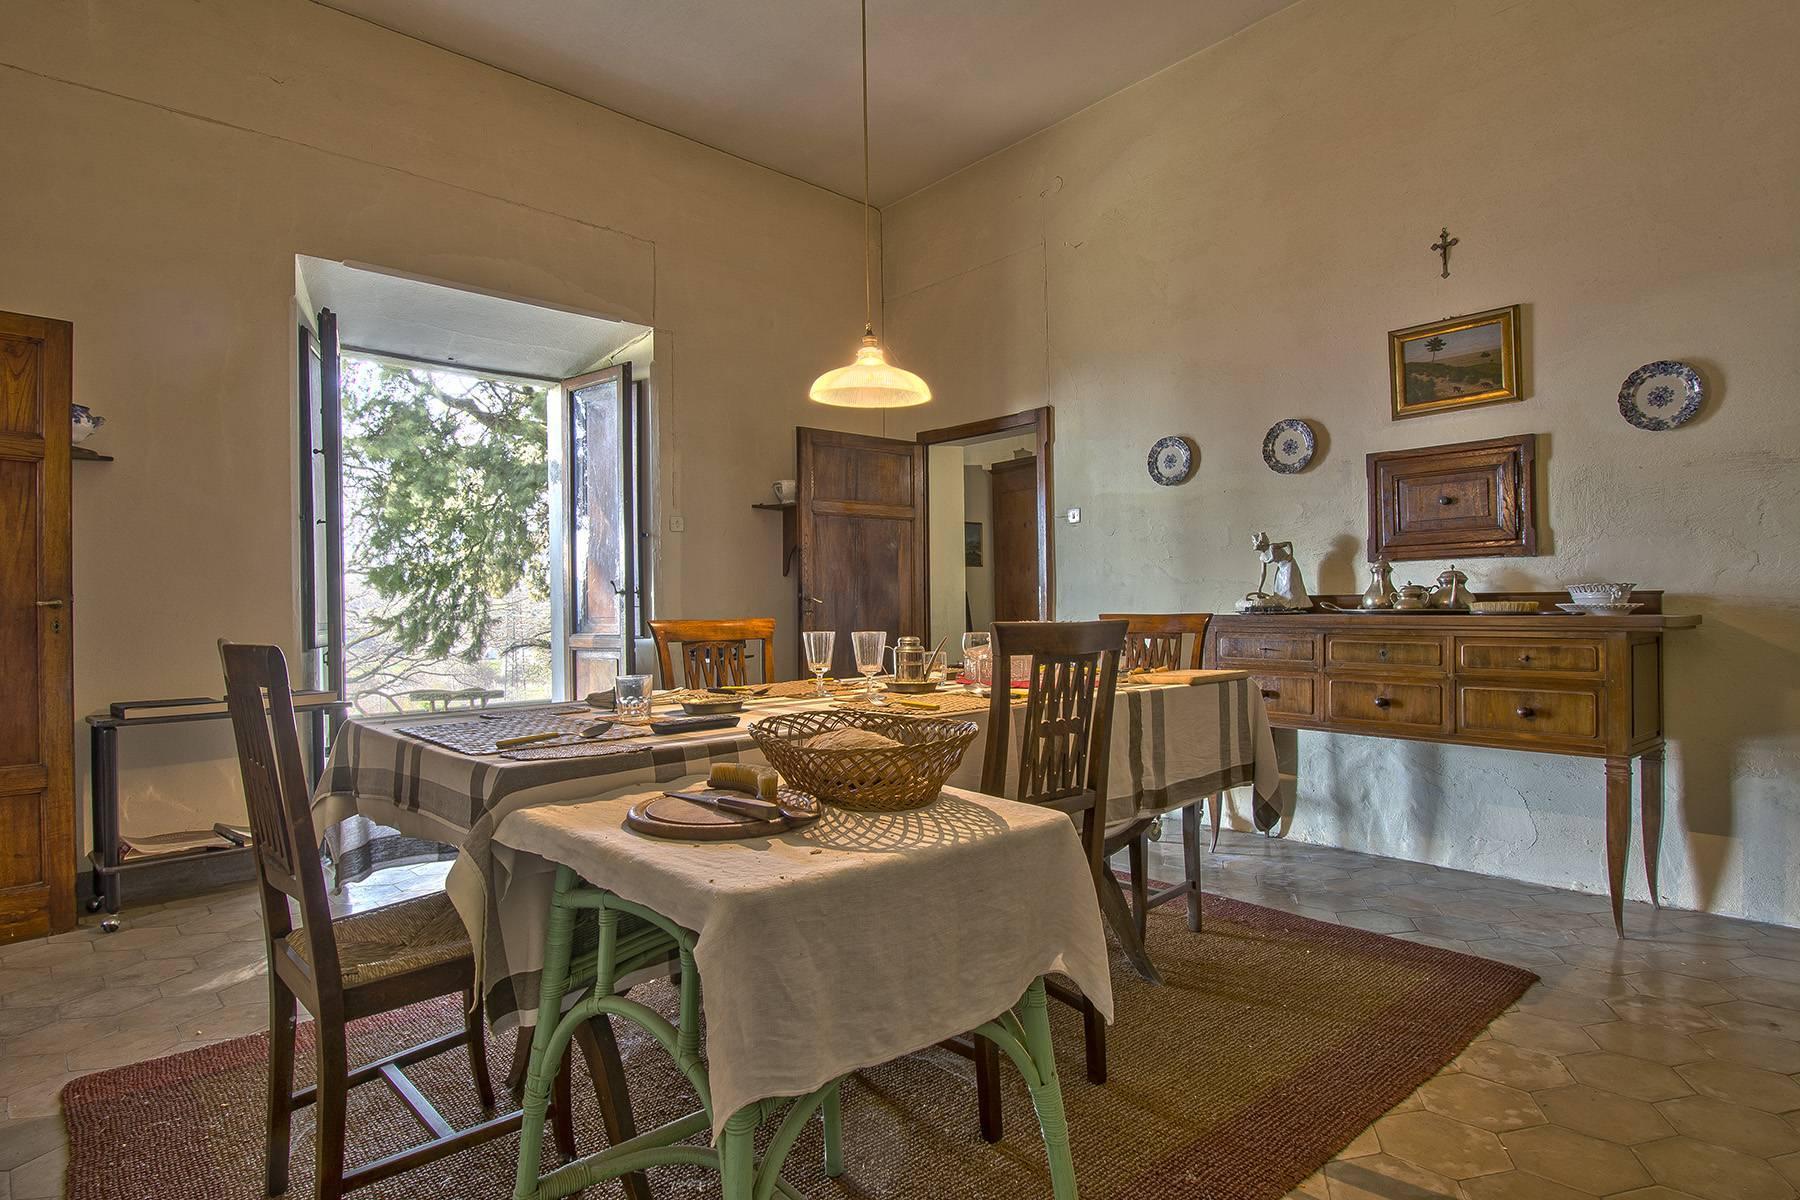 Romantic villa on the hills between Pisa and Lucca - 10